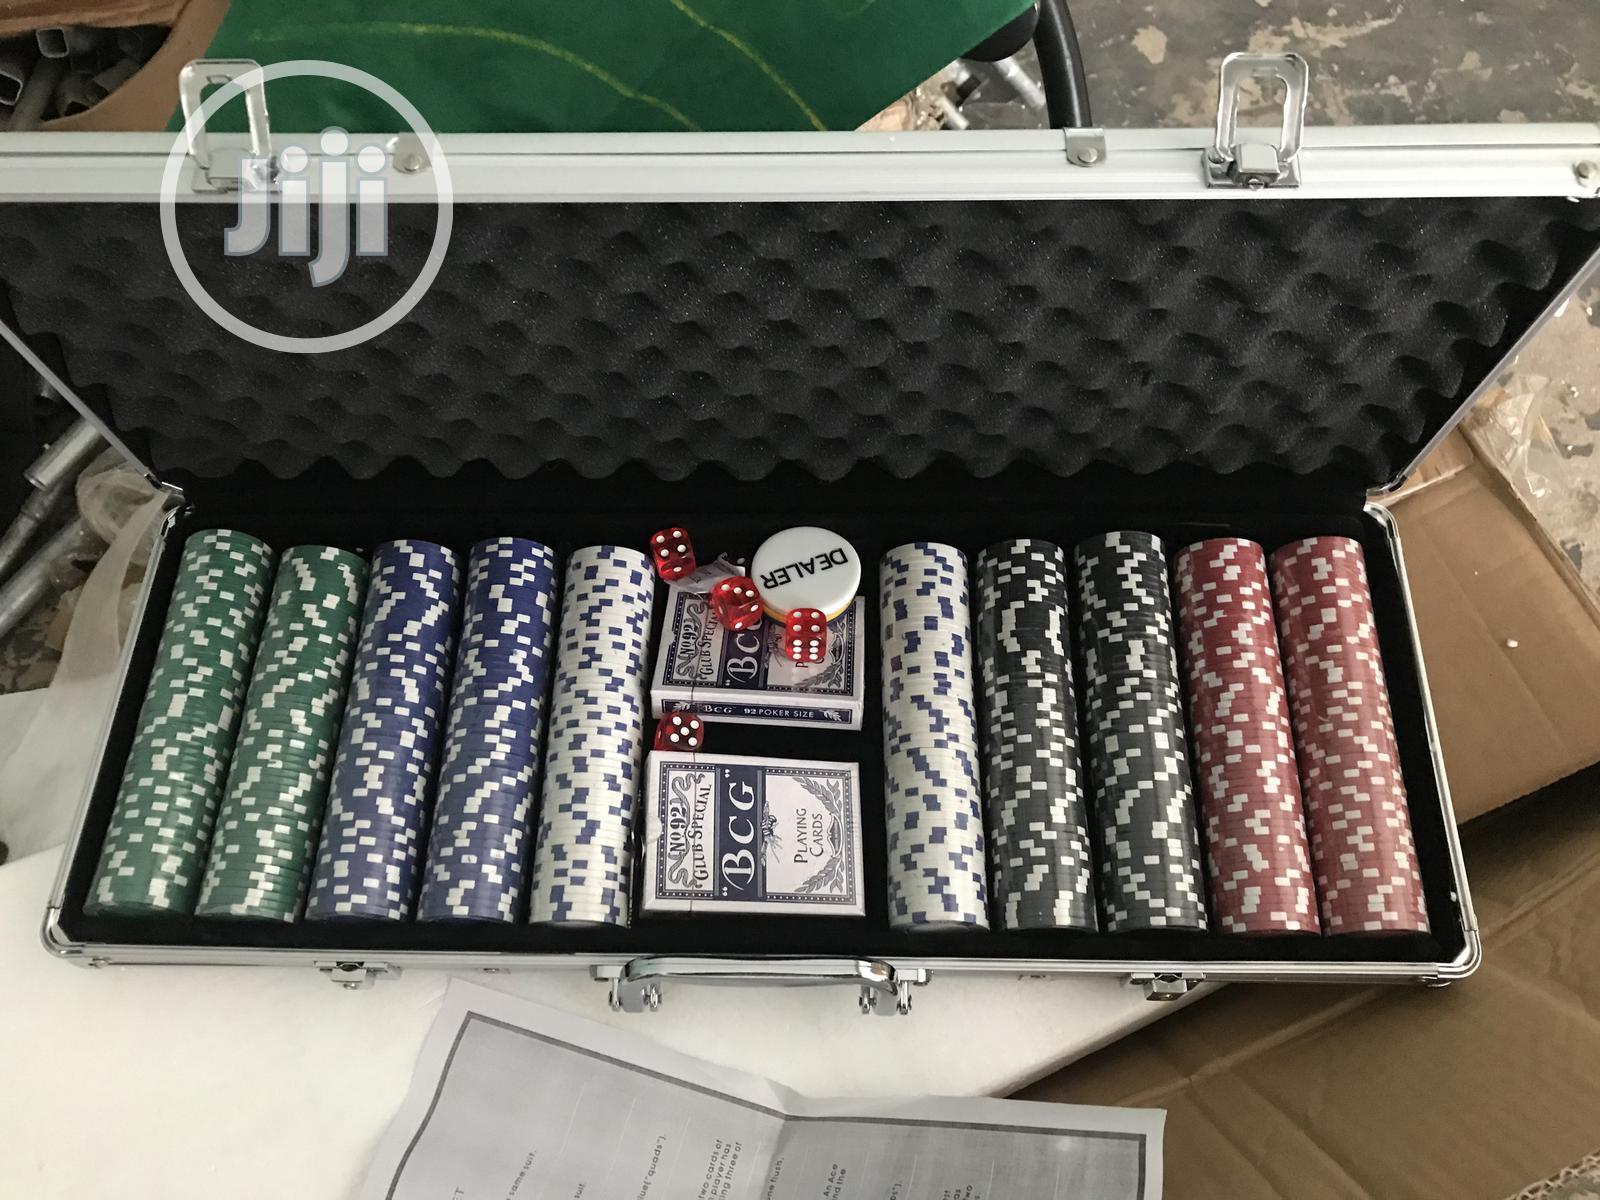 Costway Professional Poker Set W/ Silver Aluminum Case